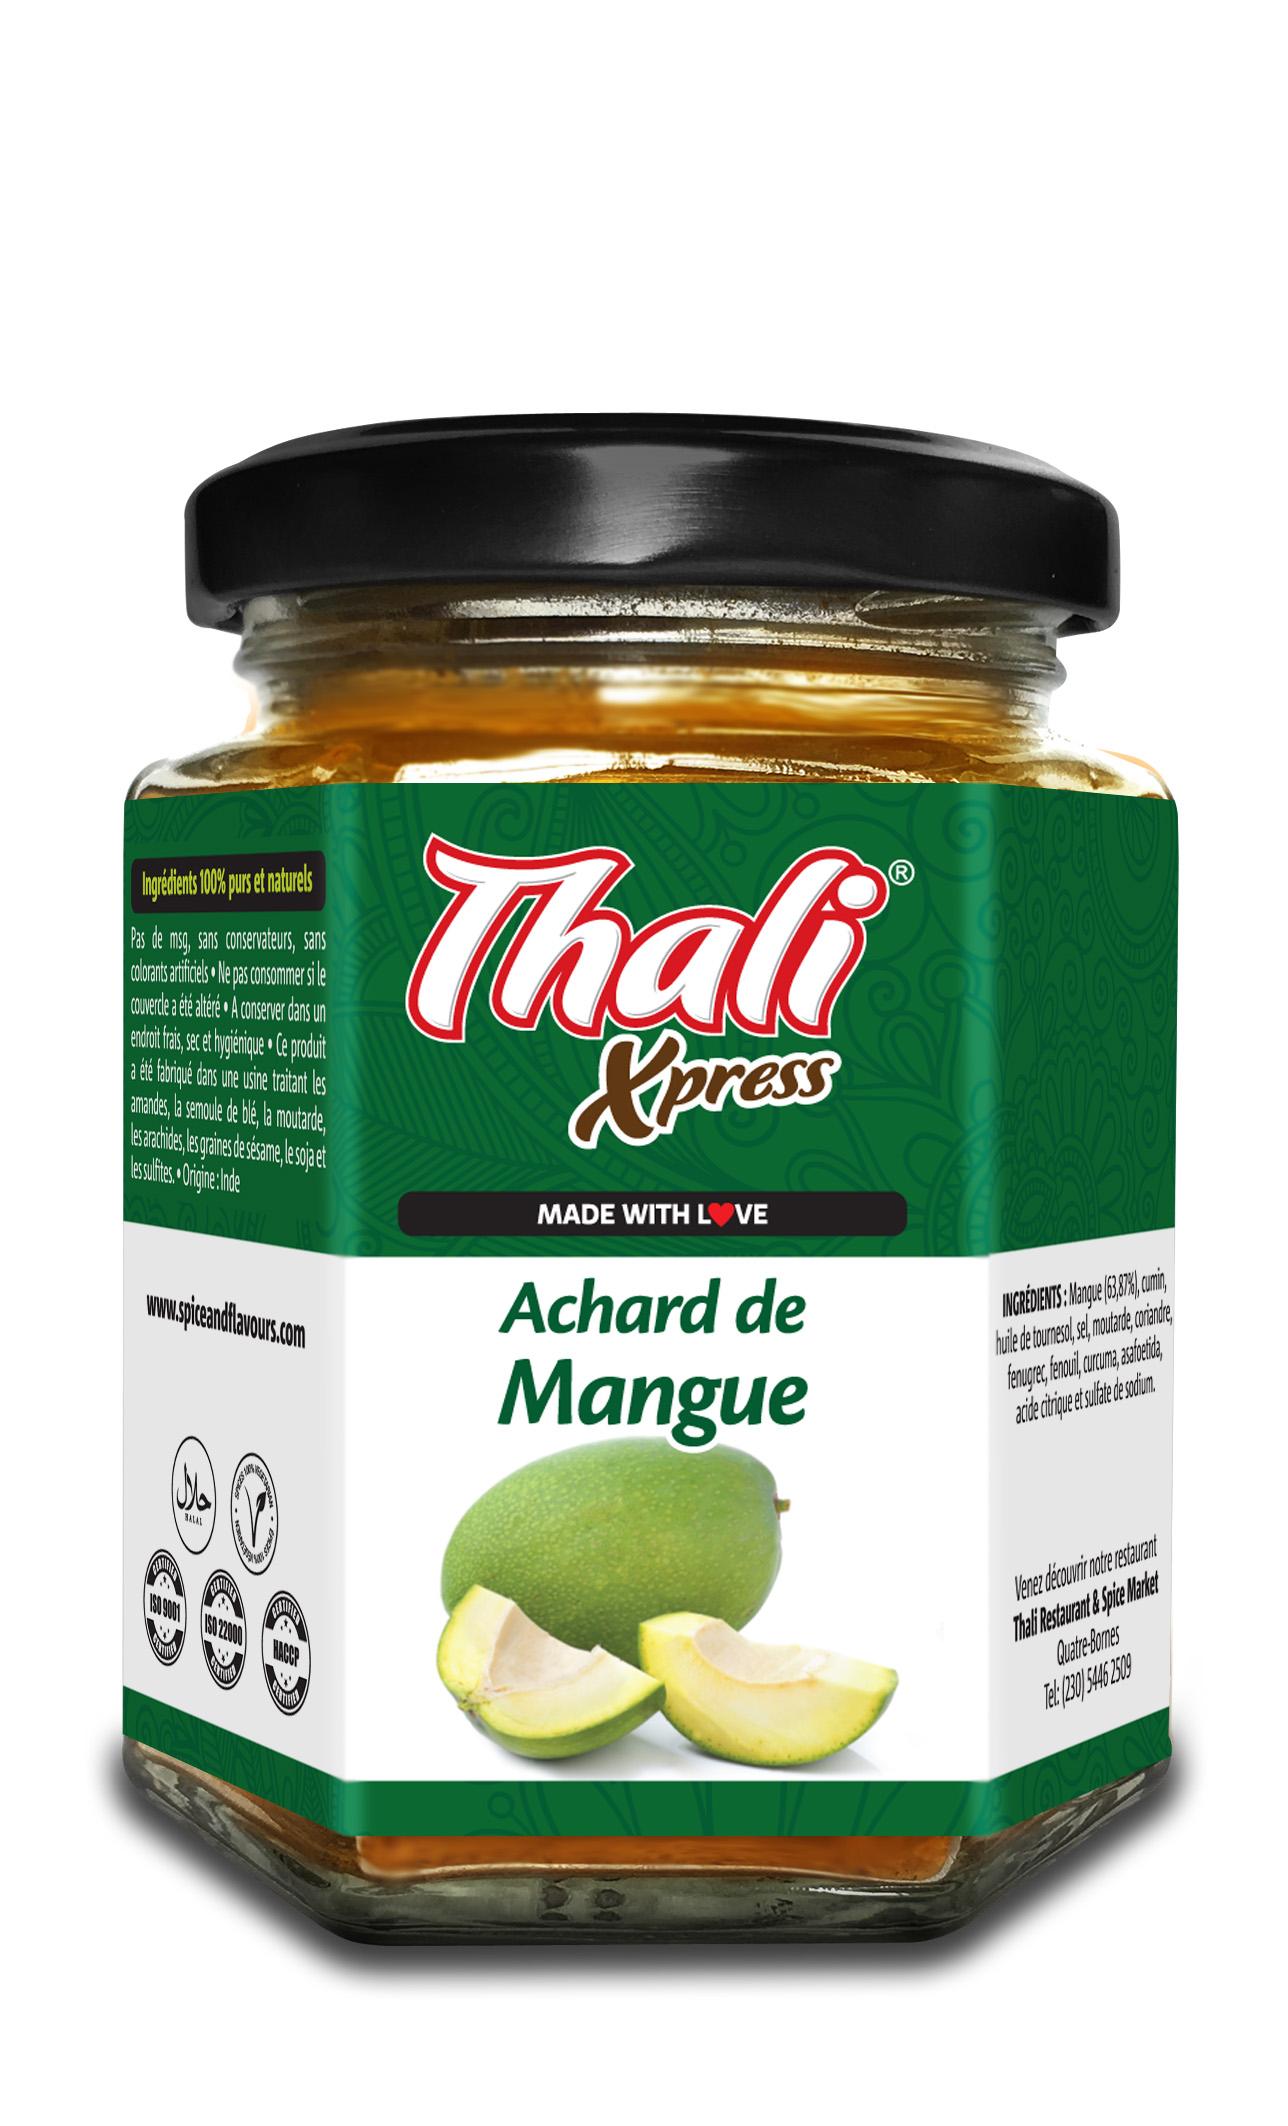 Achard de Mangue Image